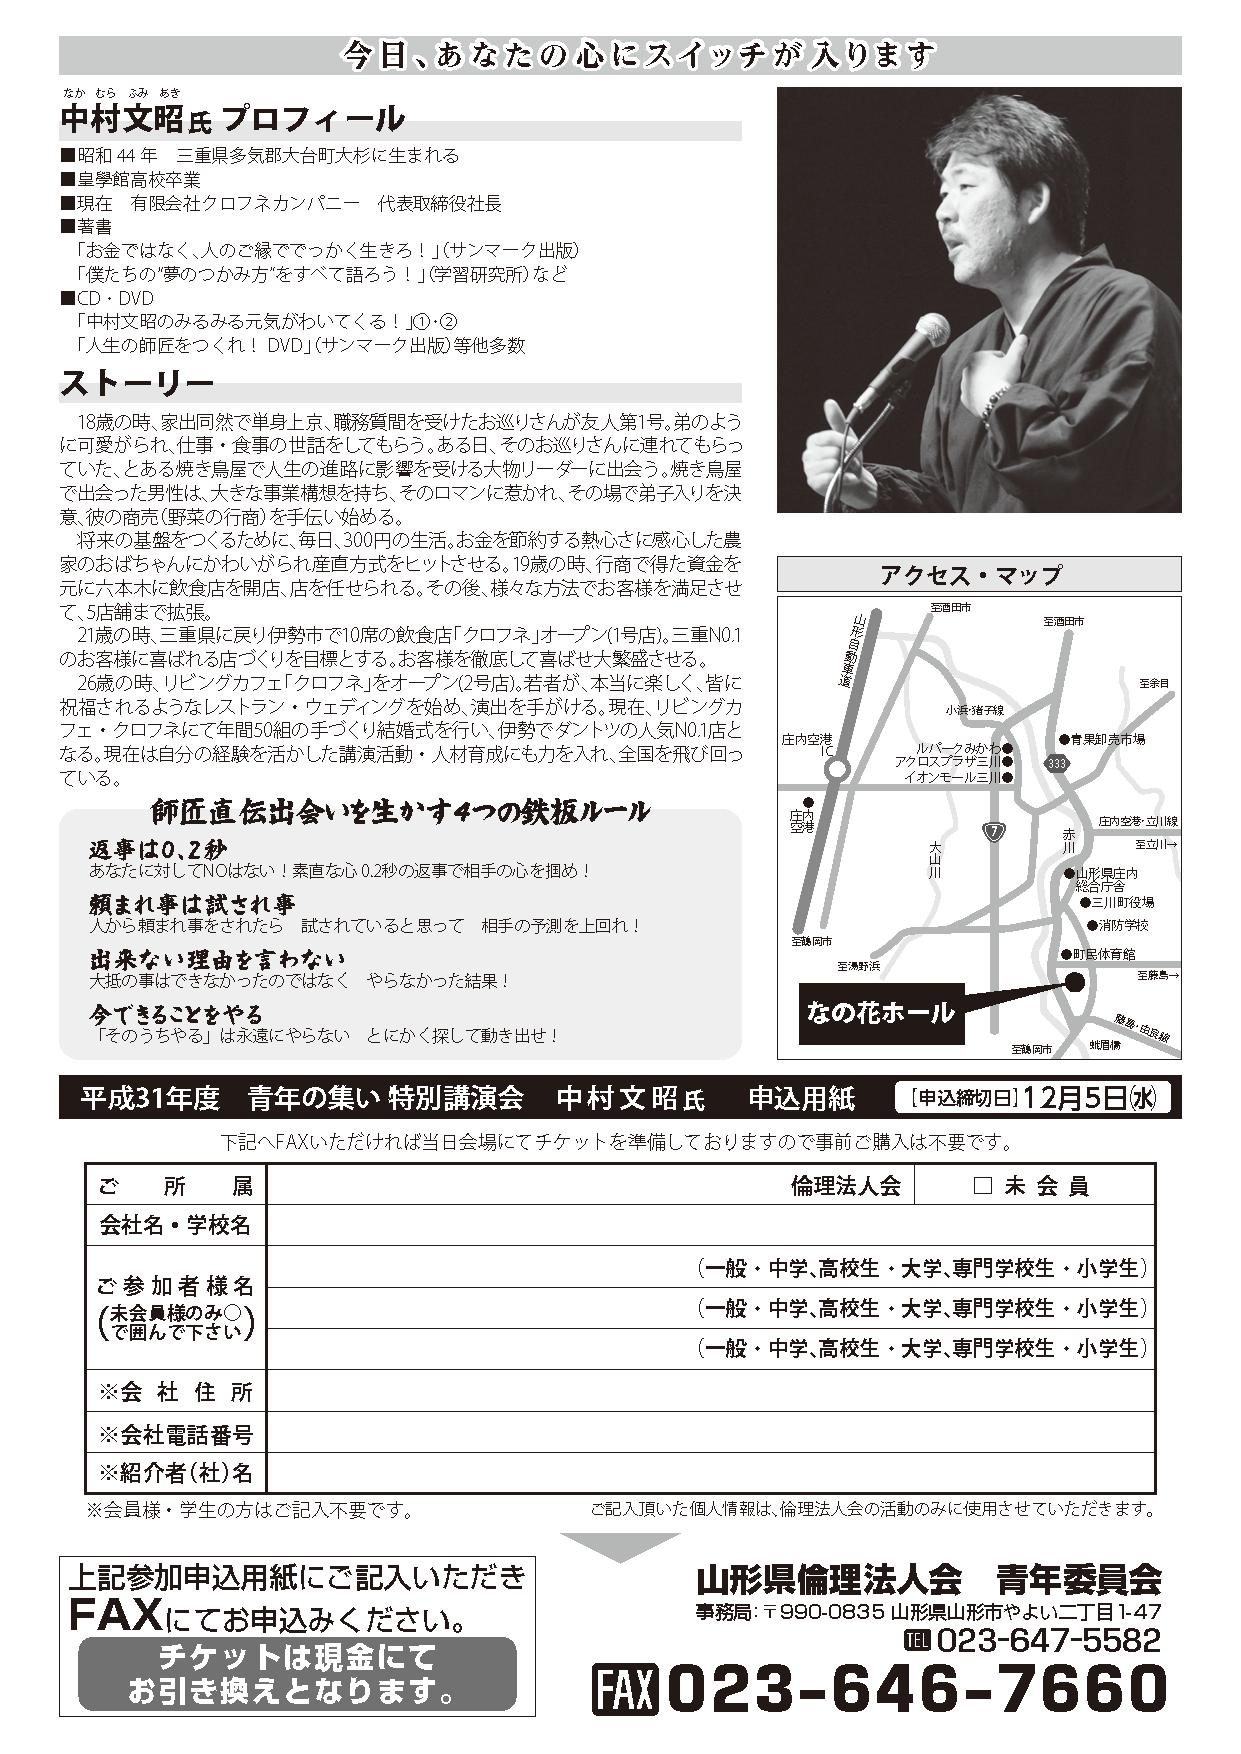 181022-pdf01-01.png